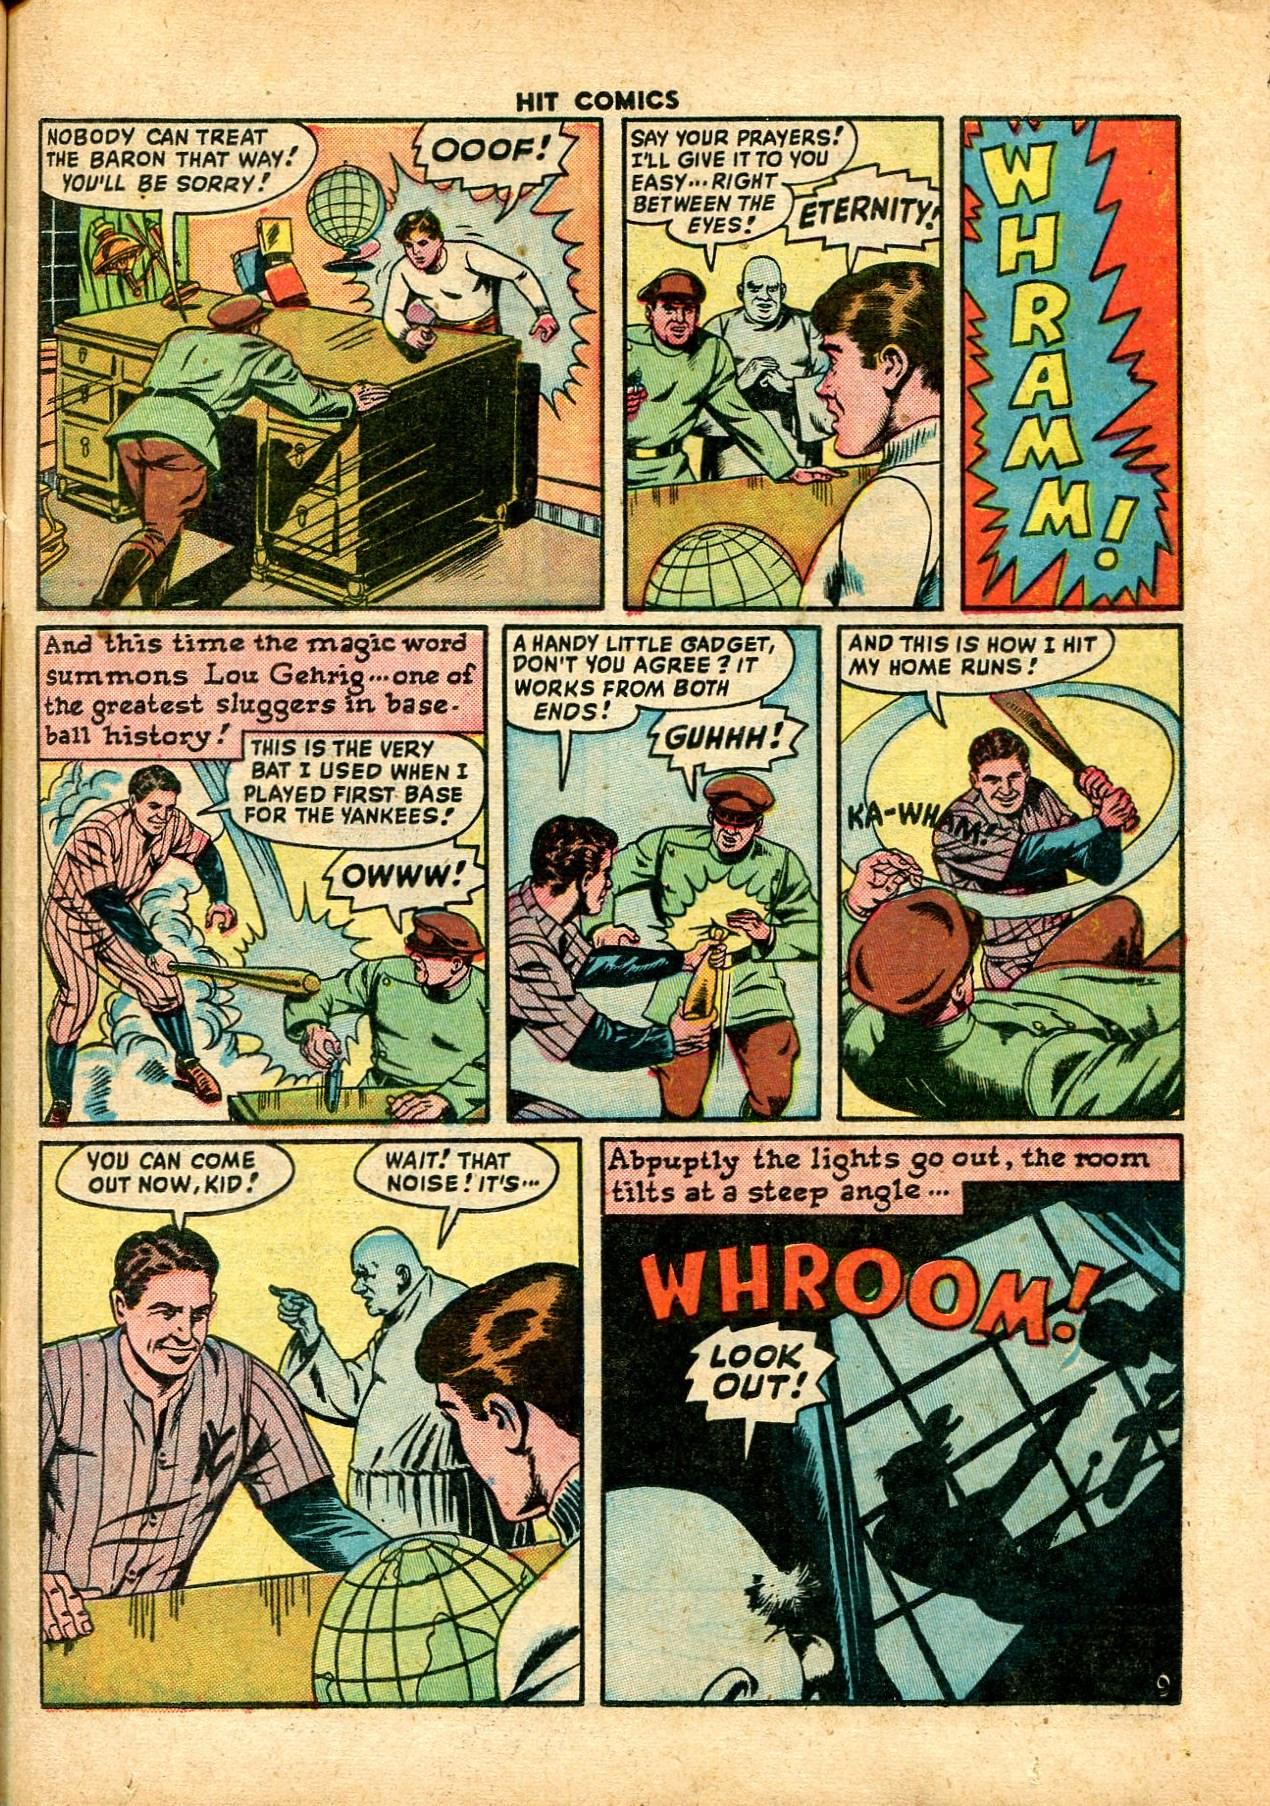 Read online Hit Comics comic -  Issue #59 - 11